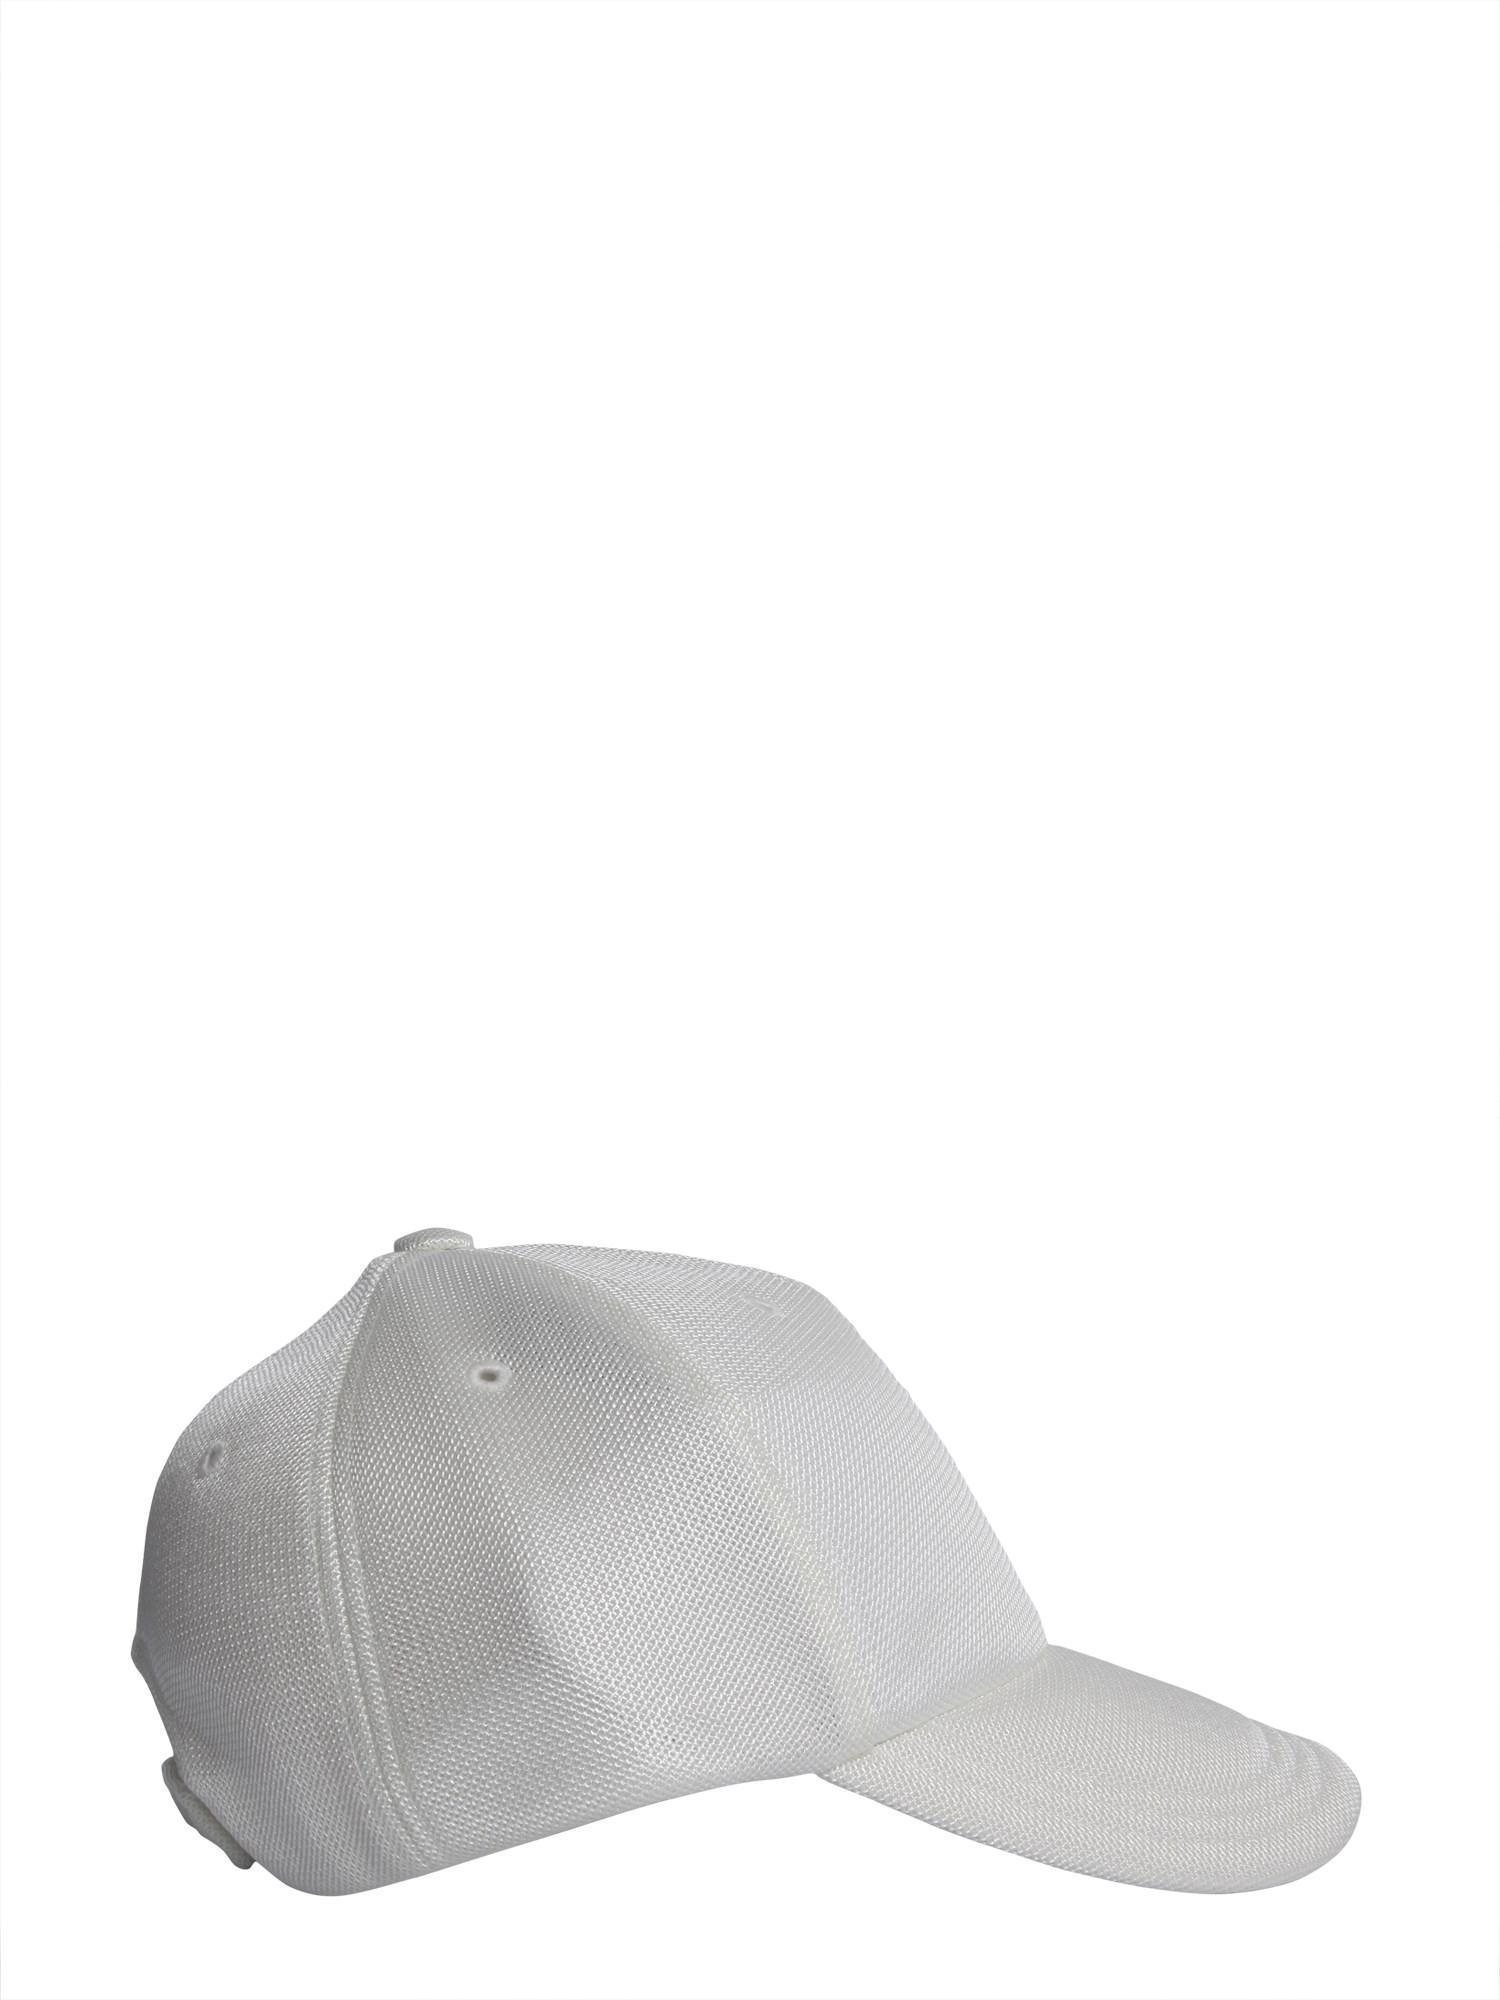 439ecee444f Lyst - Y-3 Badge Mesh Baseball Cap in White